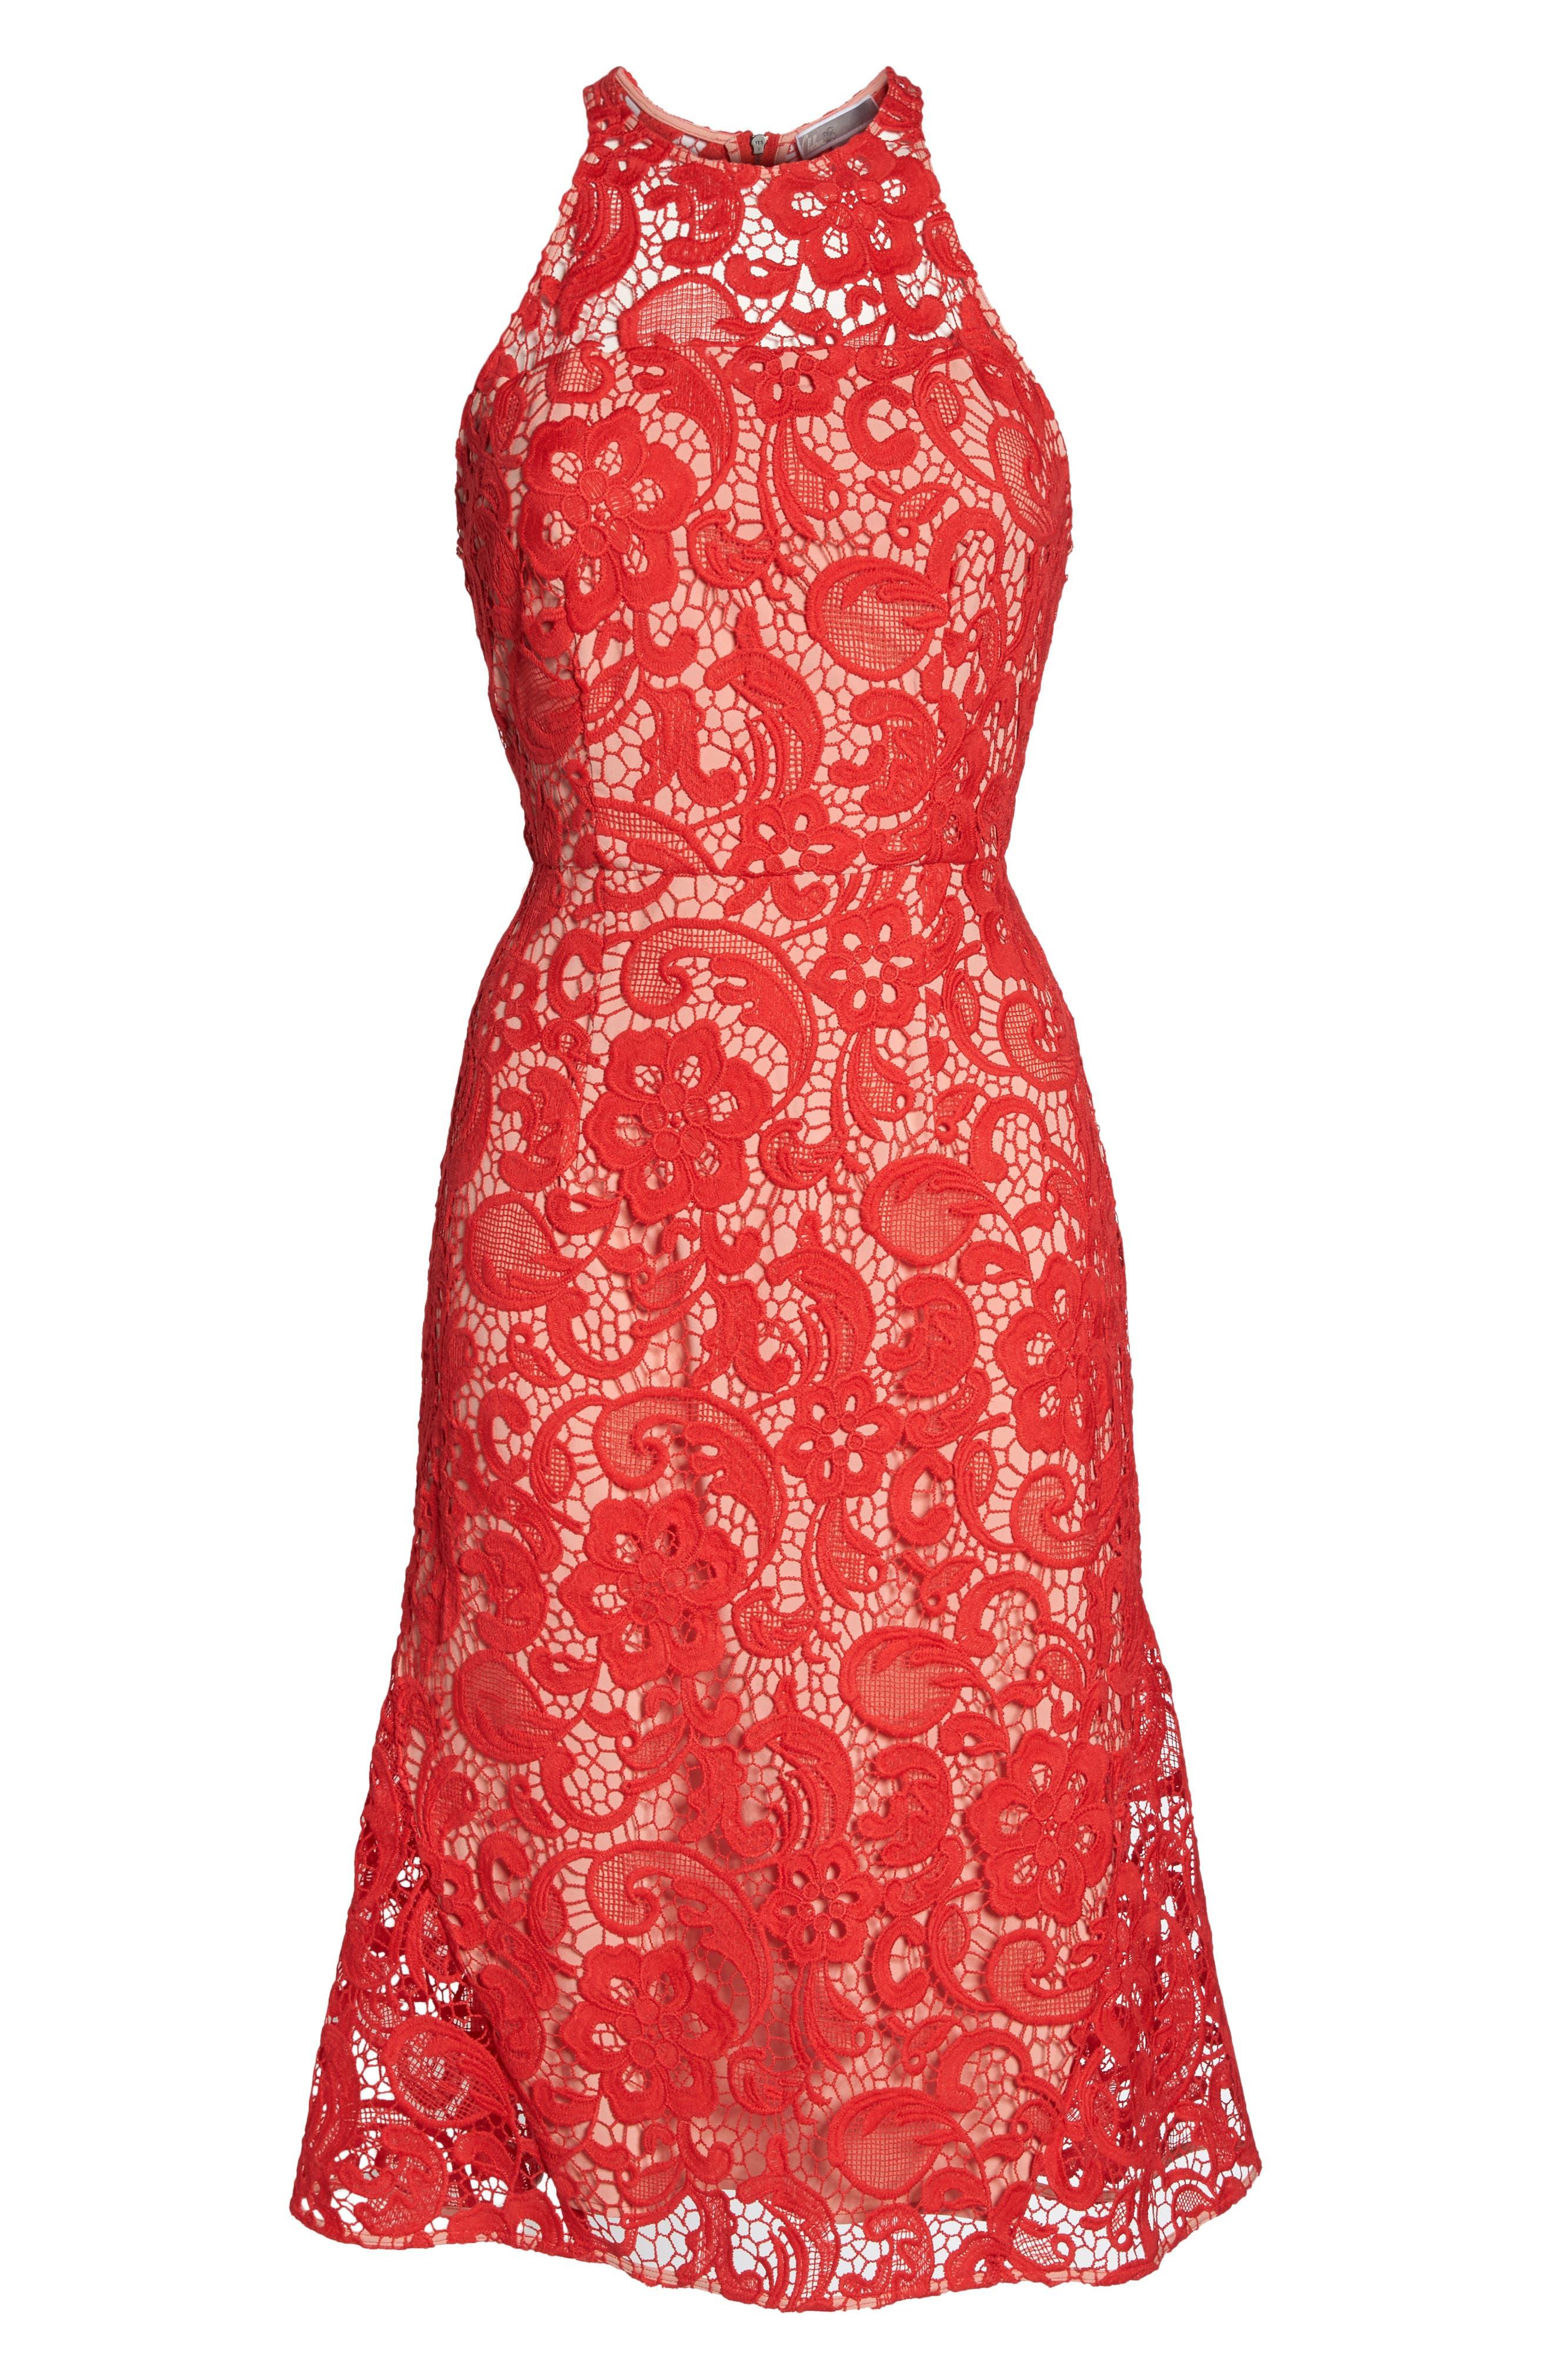 Carnation Lace Dress,                             Alternate thumbnail 6, color,                             600